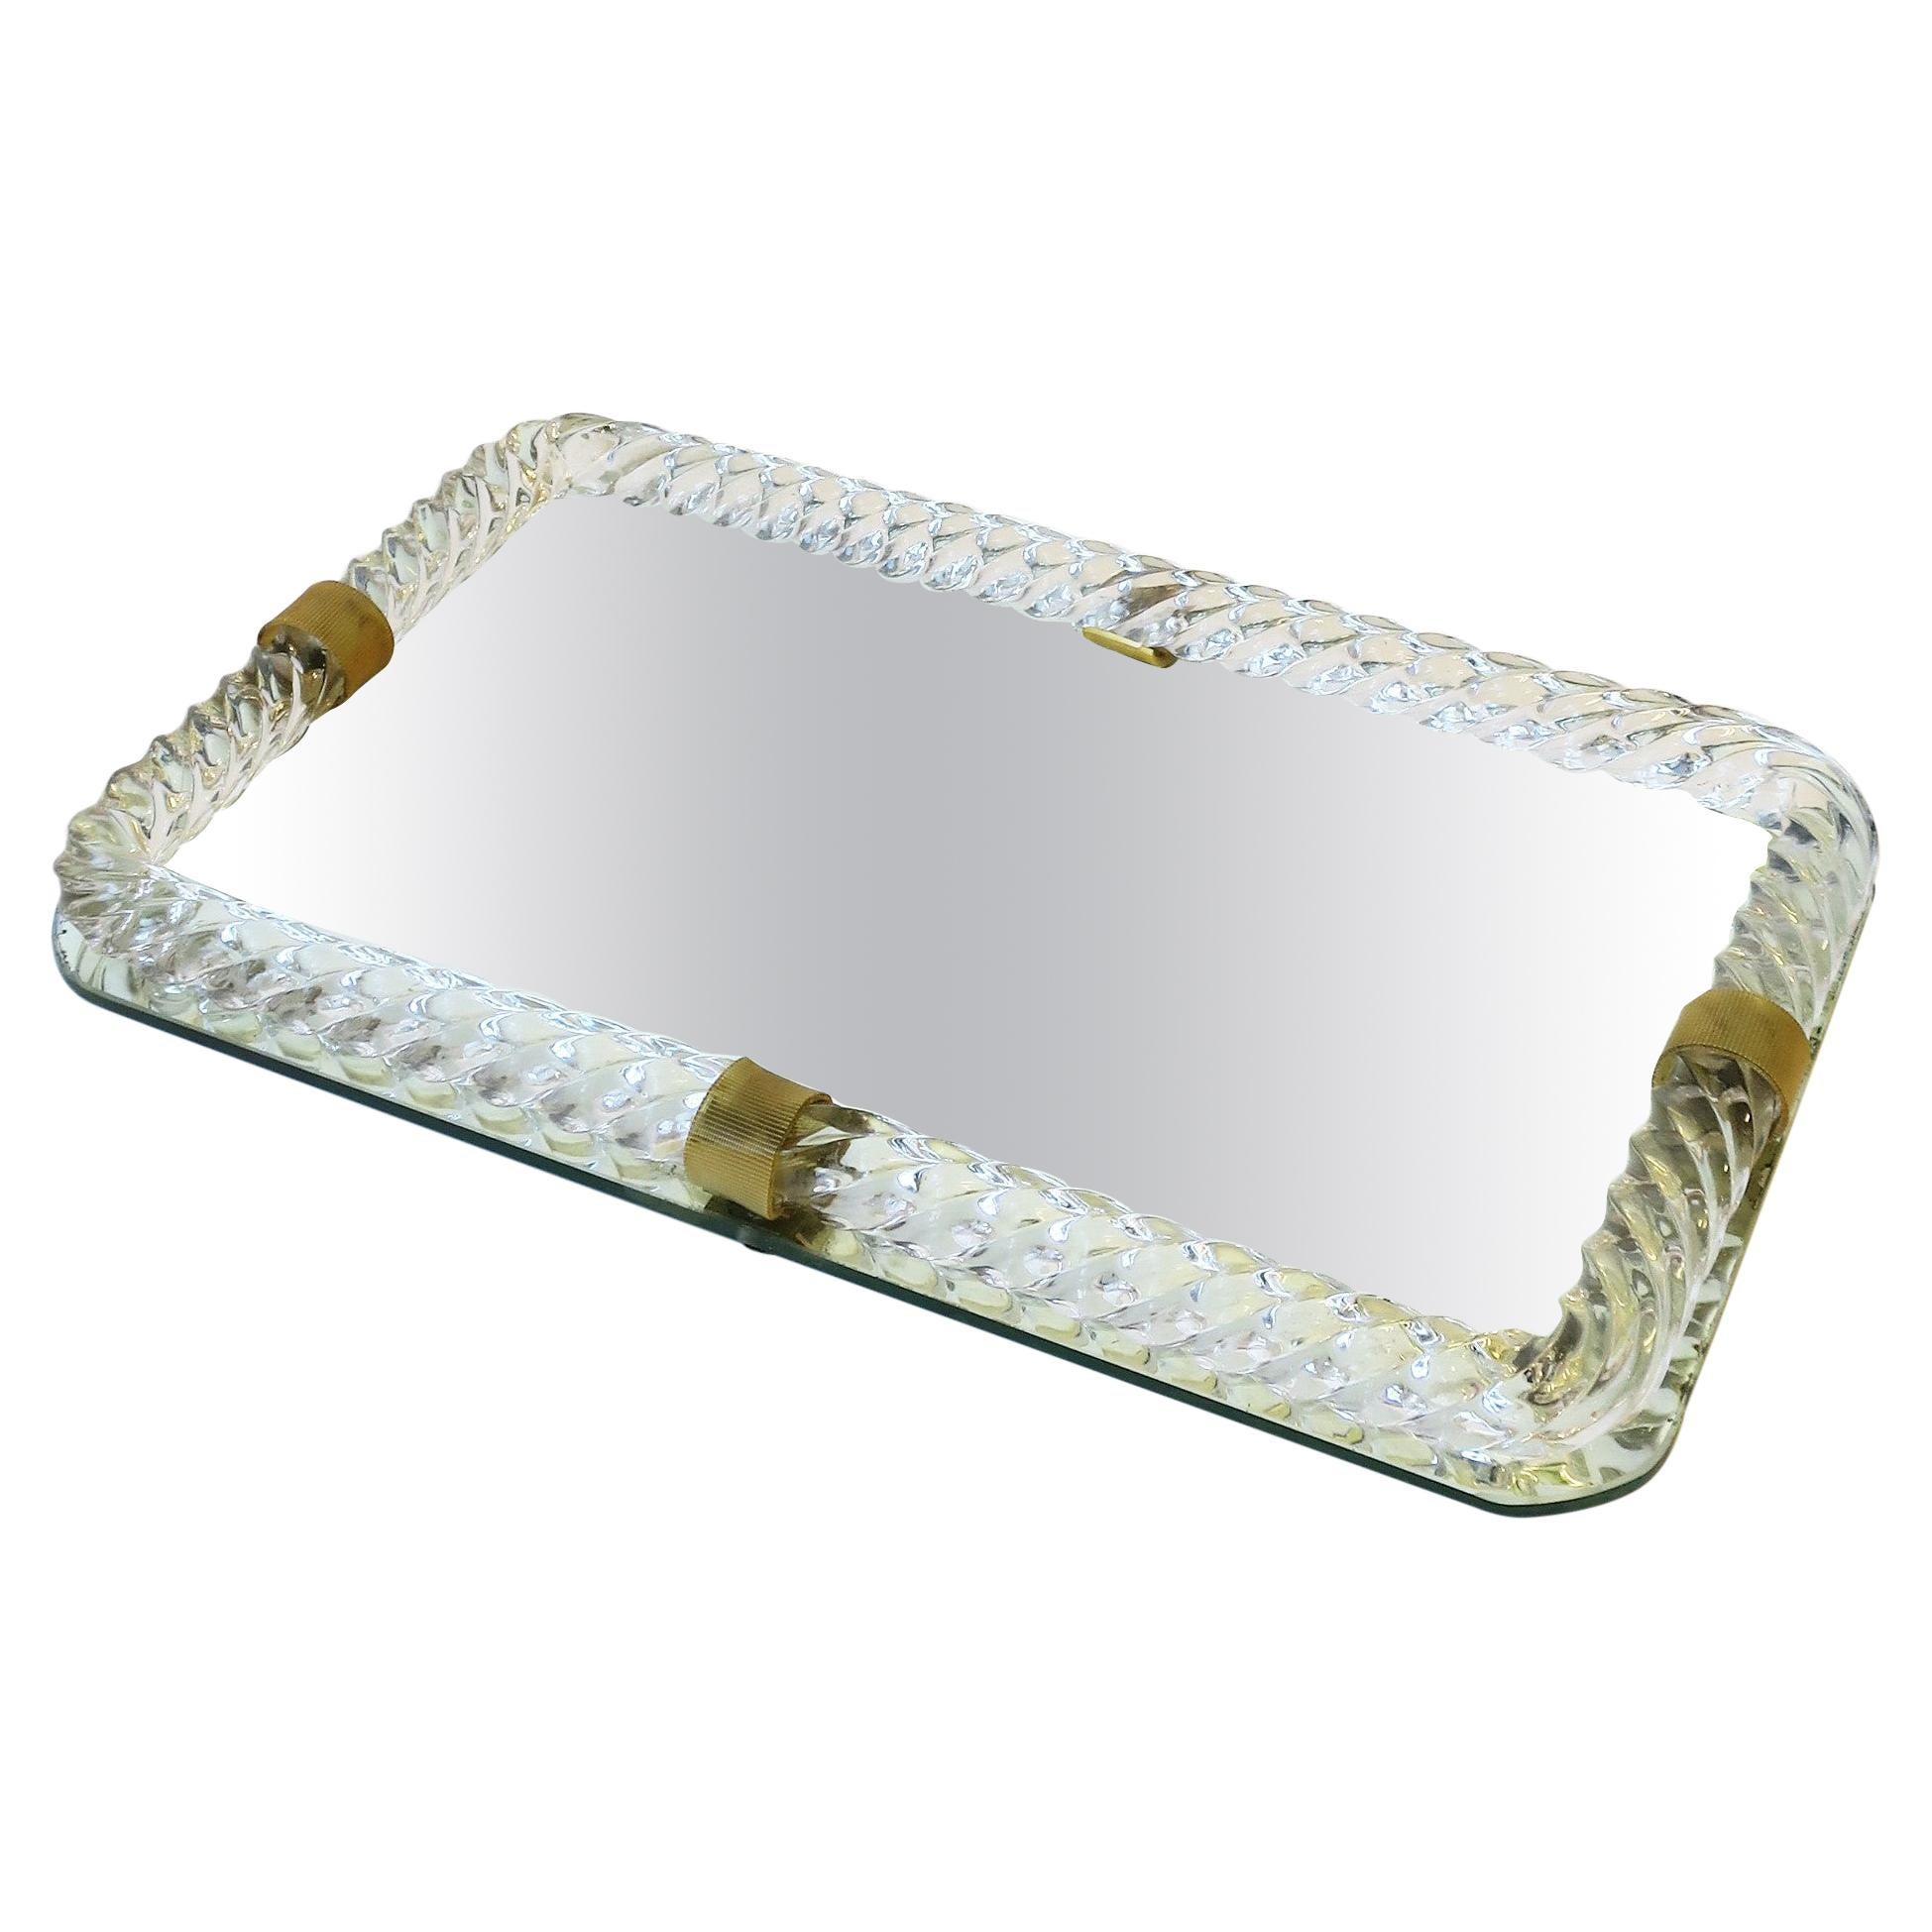 Italian Murano Art Glass and Mirror Vanity Tray in the Style of Venini